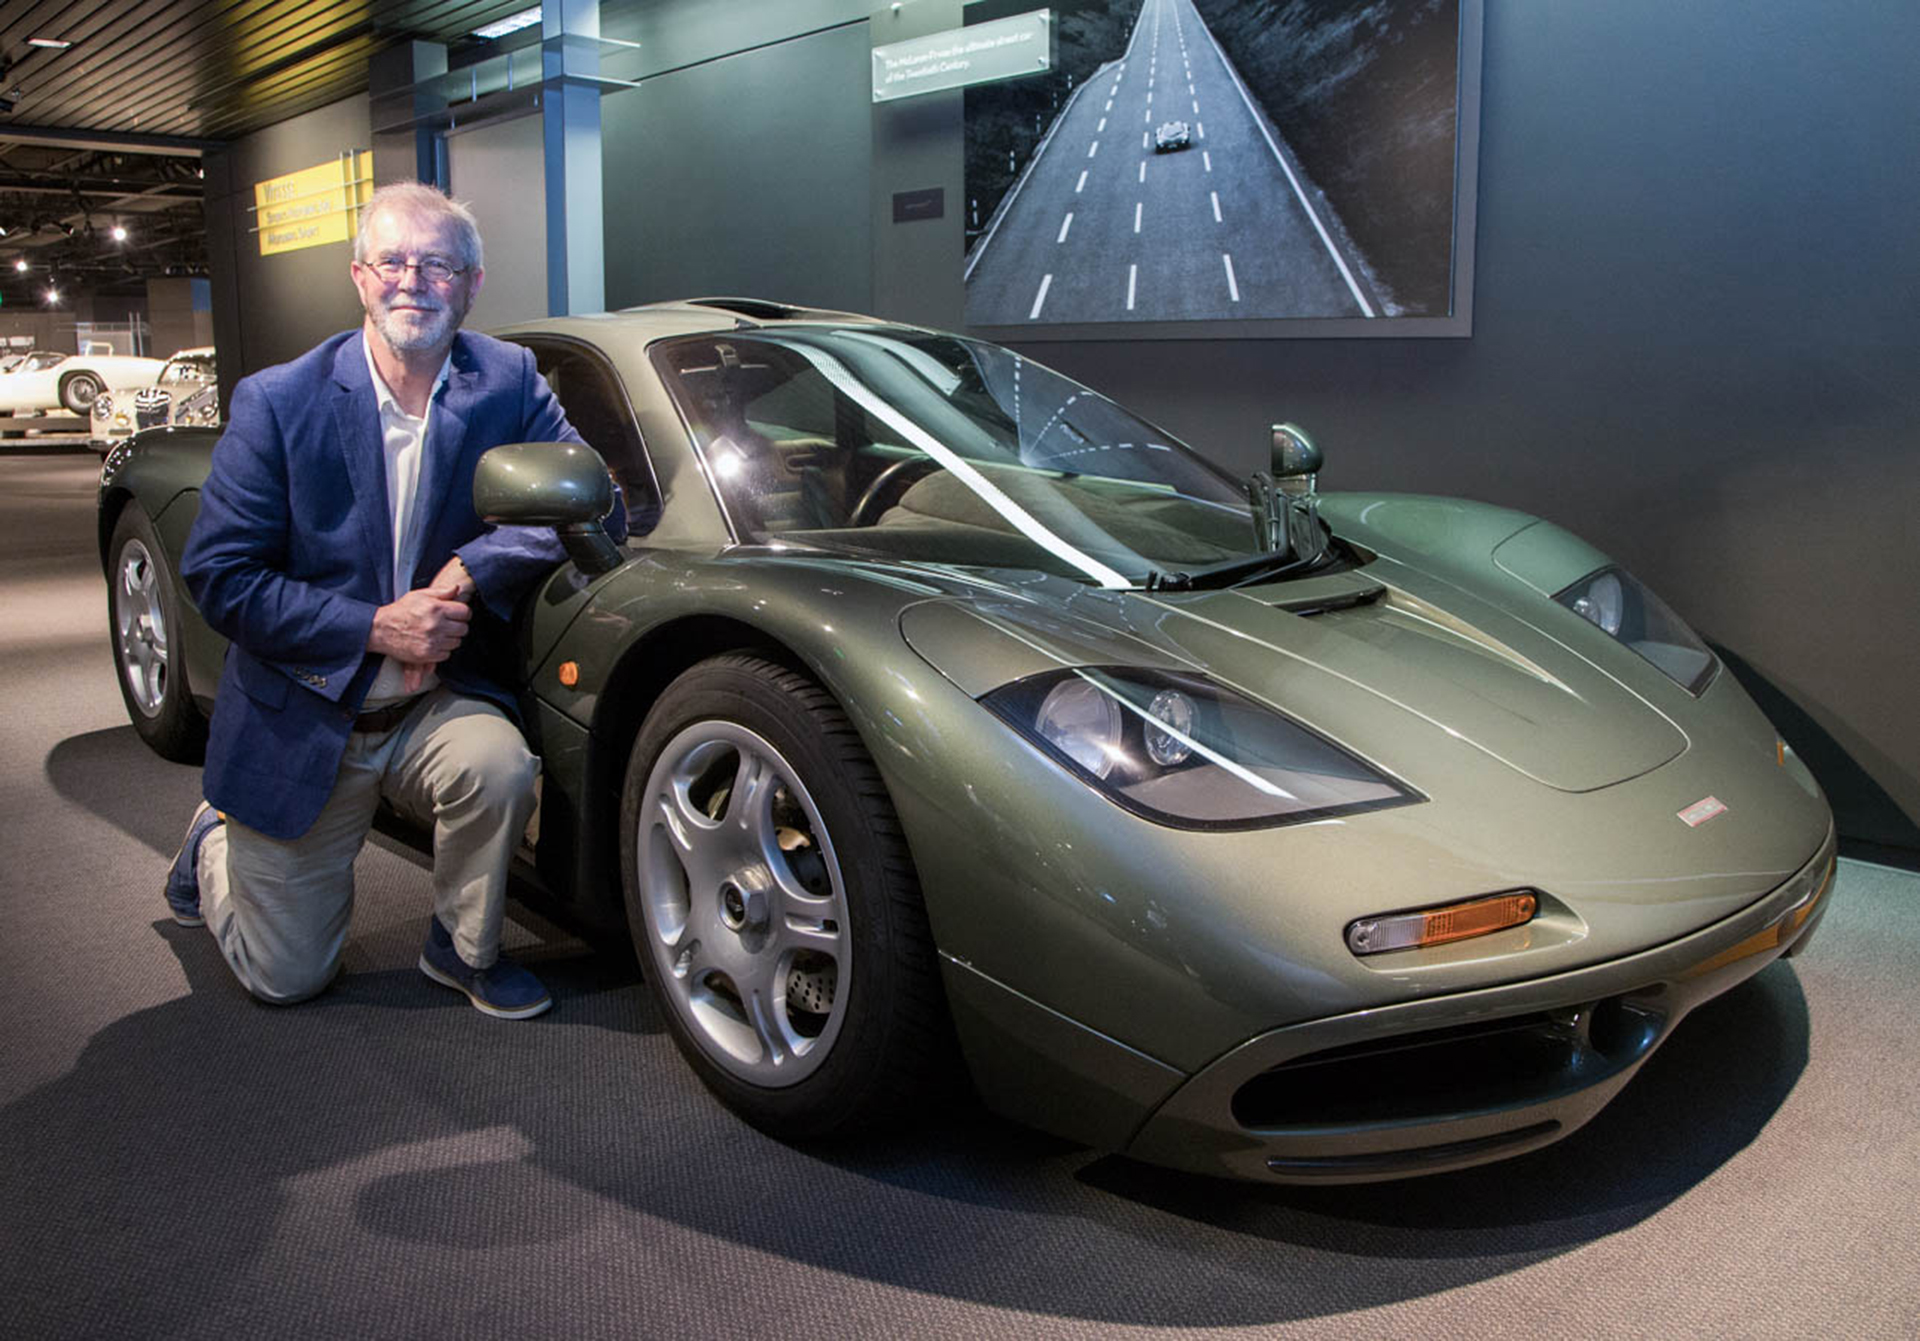 McLaren F1 - designer Peter Stevens